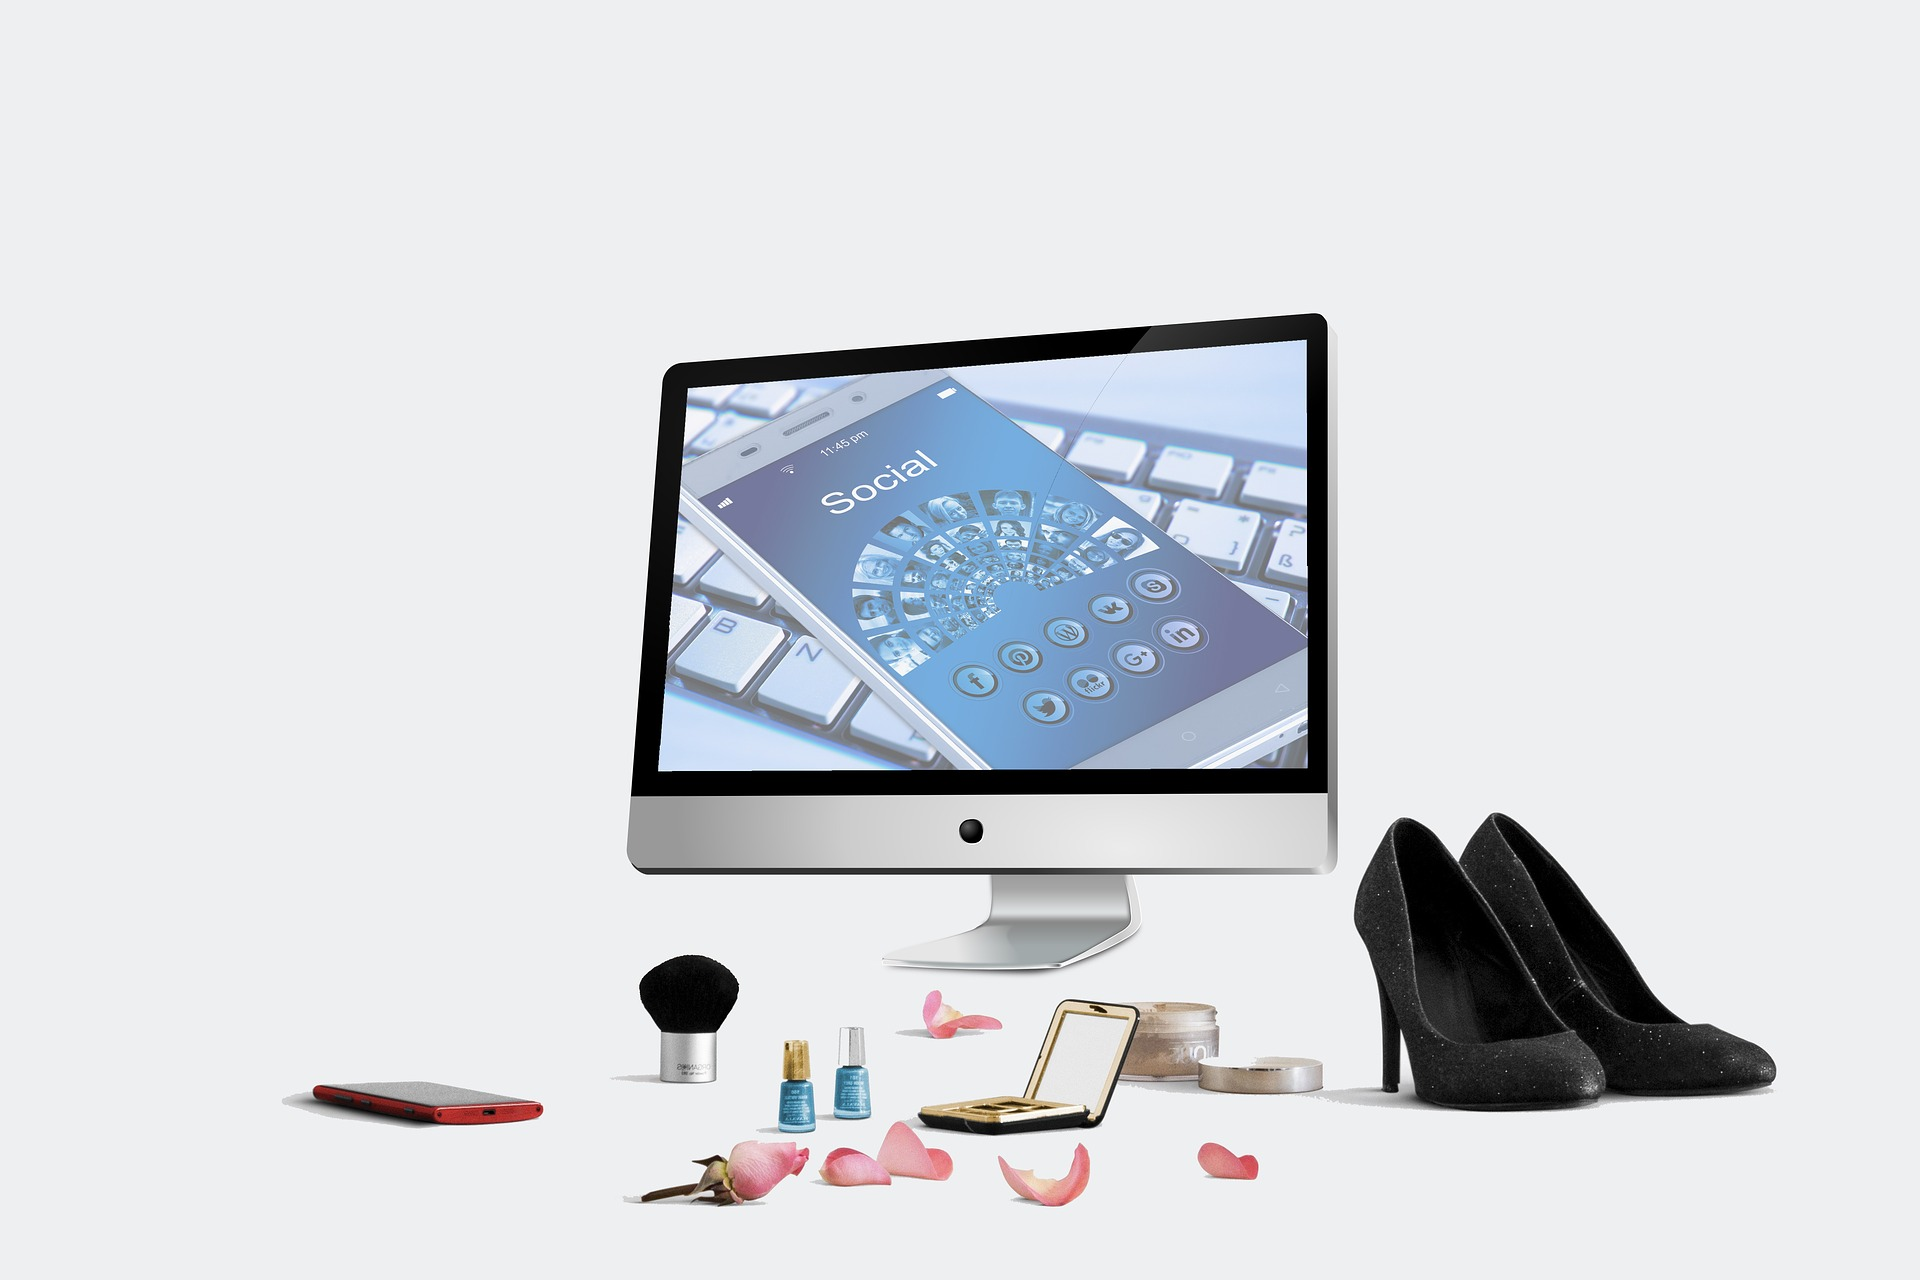 Social Media Social Life Style Instagram Product